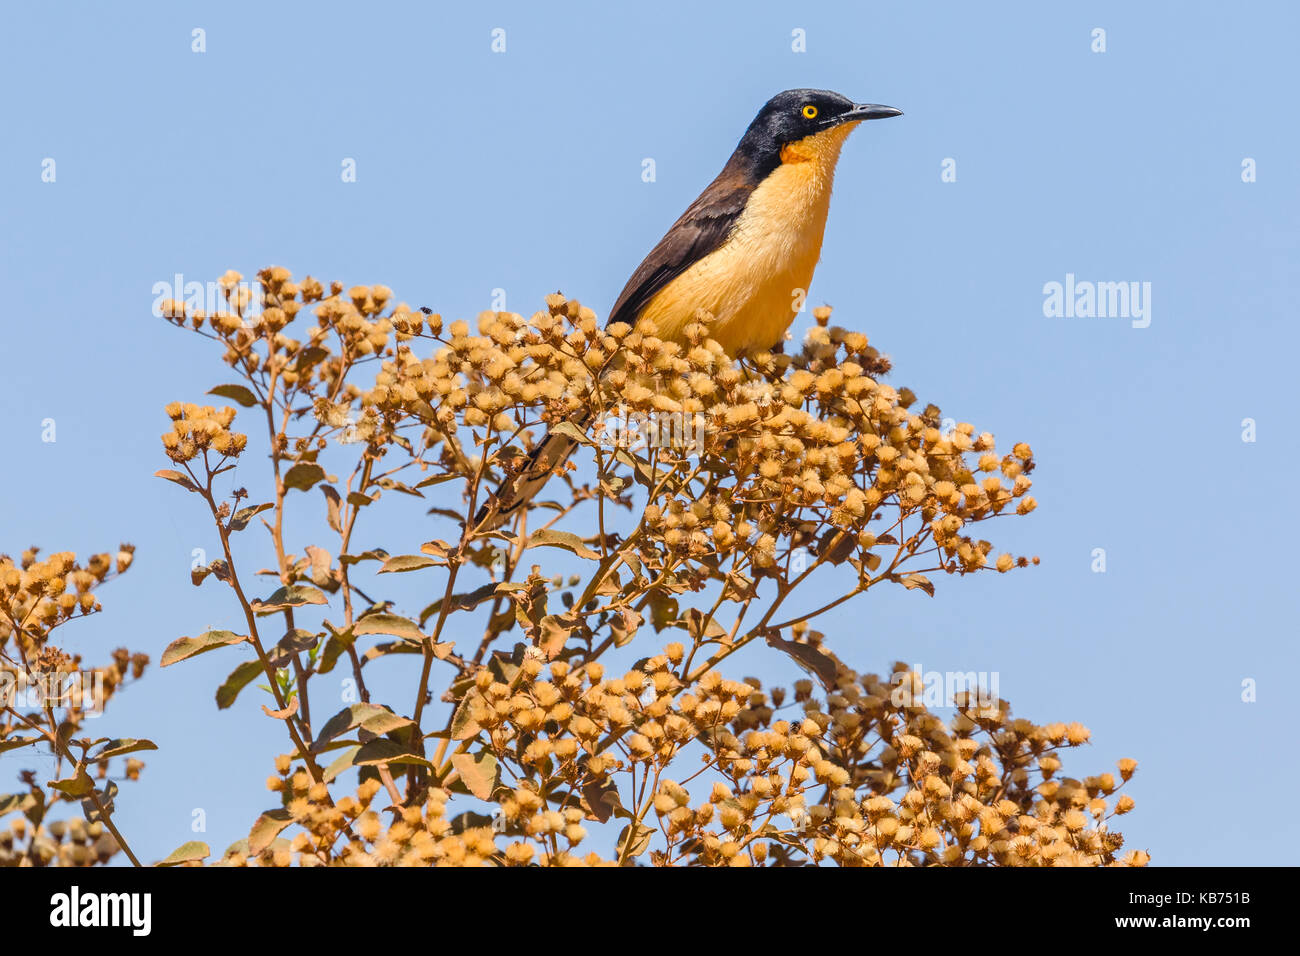 Black-capped Donacobius (Donacobius atricapillus) resting on a bush, Brazil, Mato Grosso, Pantanal - Stock Image